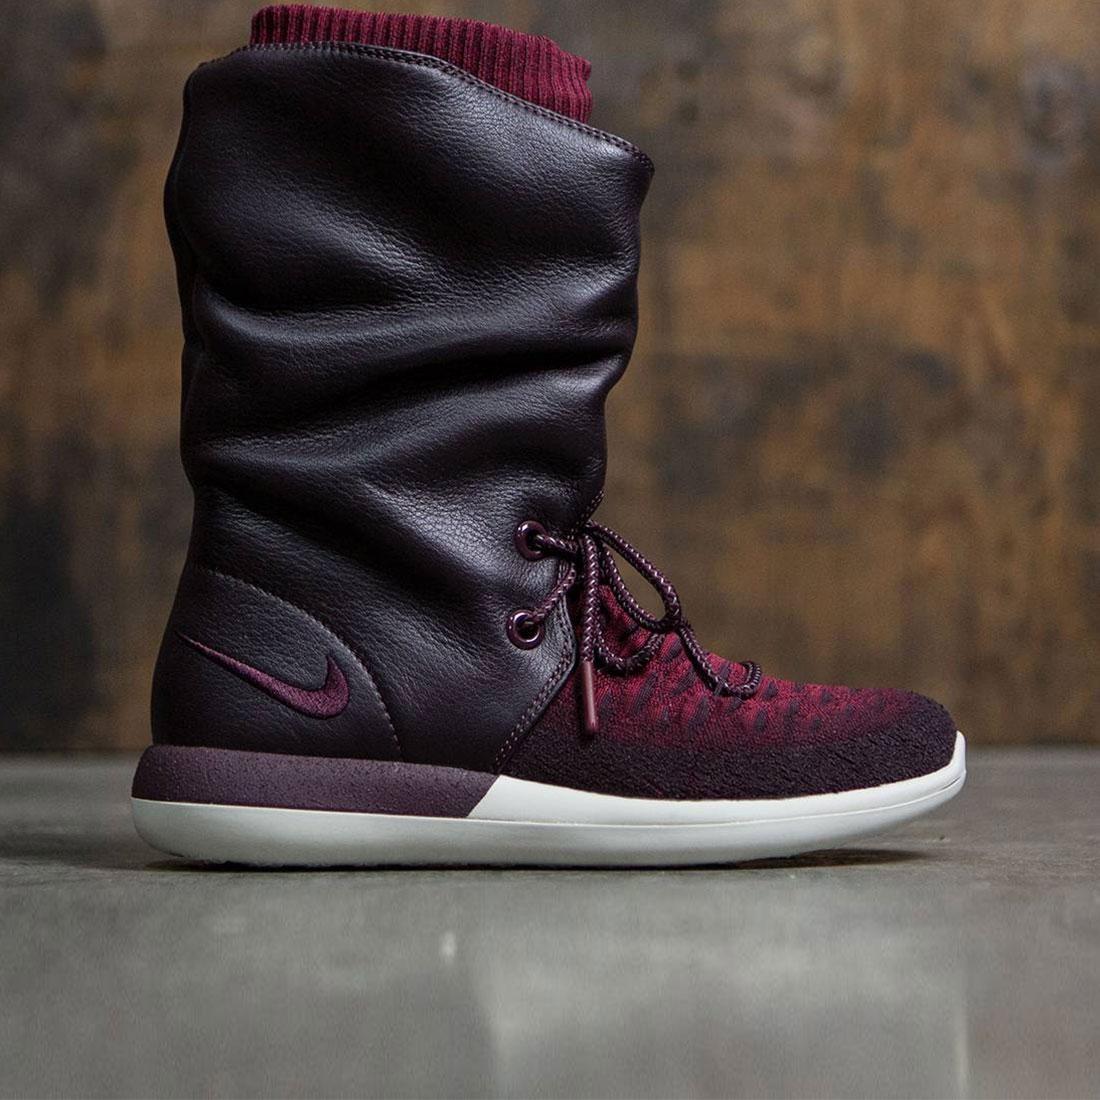 newest 51032 758c5 Nike Women Roshe Two Flyknit Hi (deep burgundy   deep burgundy-team red)